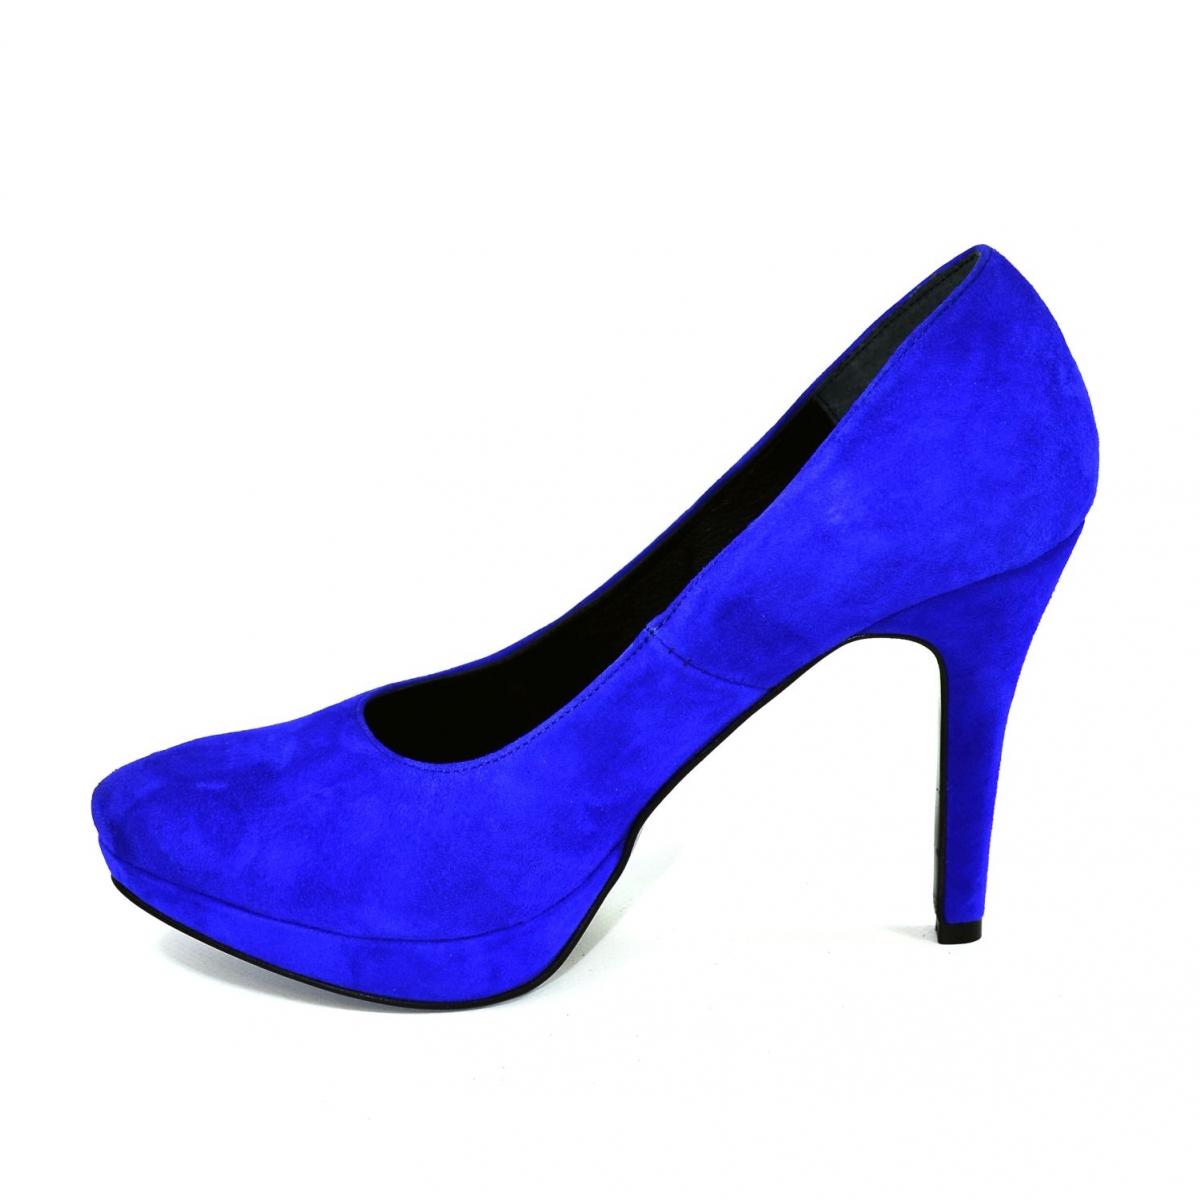 7b60205e4316 Dámske modré semišové lodičky VENITA - 6